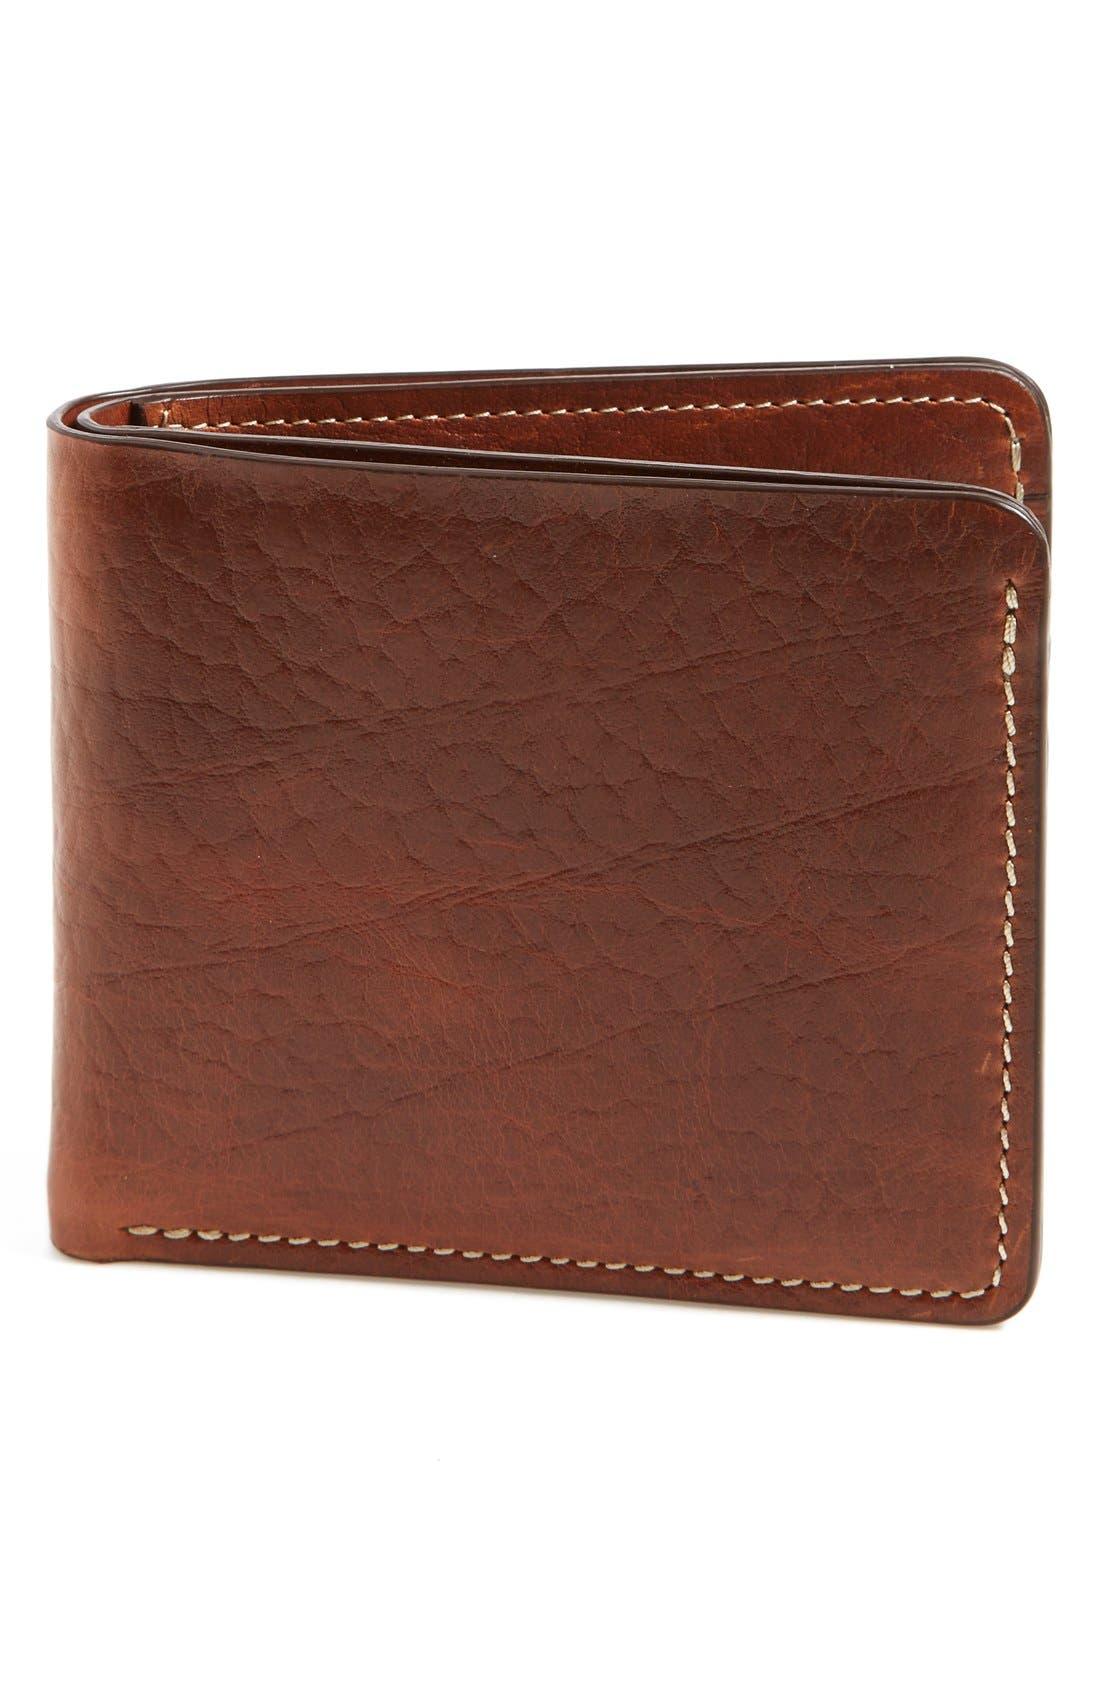 'Jackson' Bison Leather Wallet,                         Main,                         color, 700